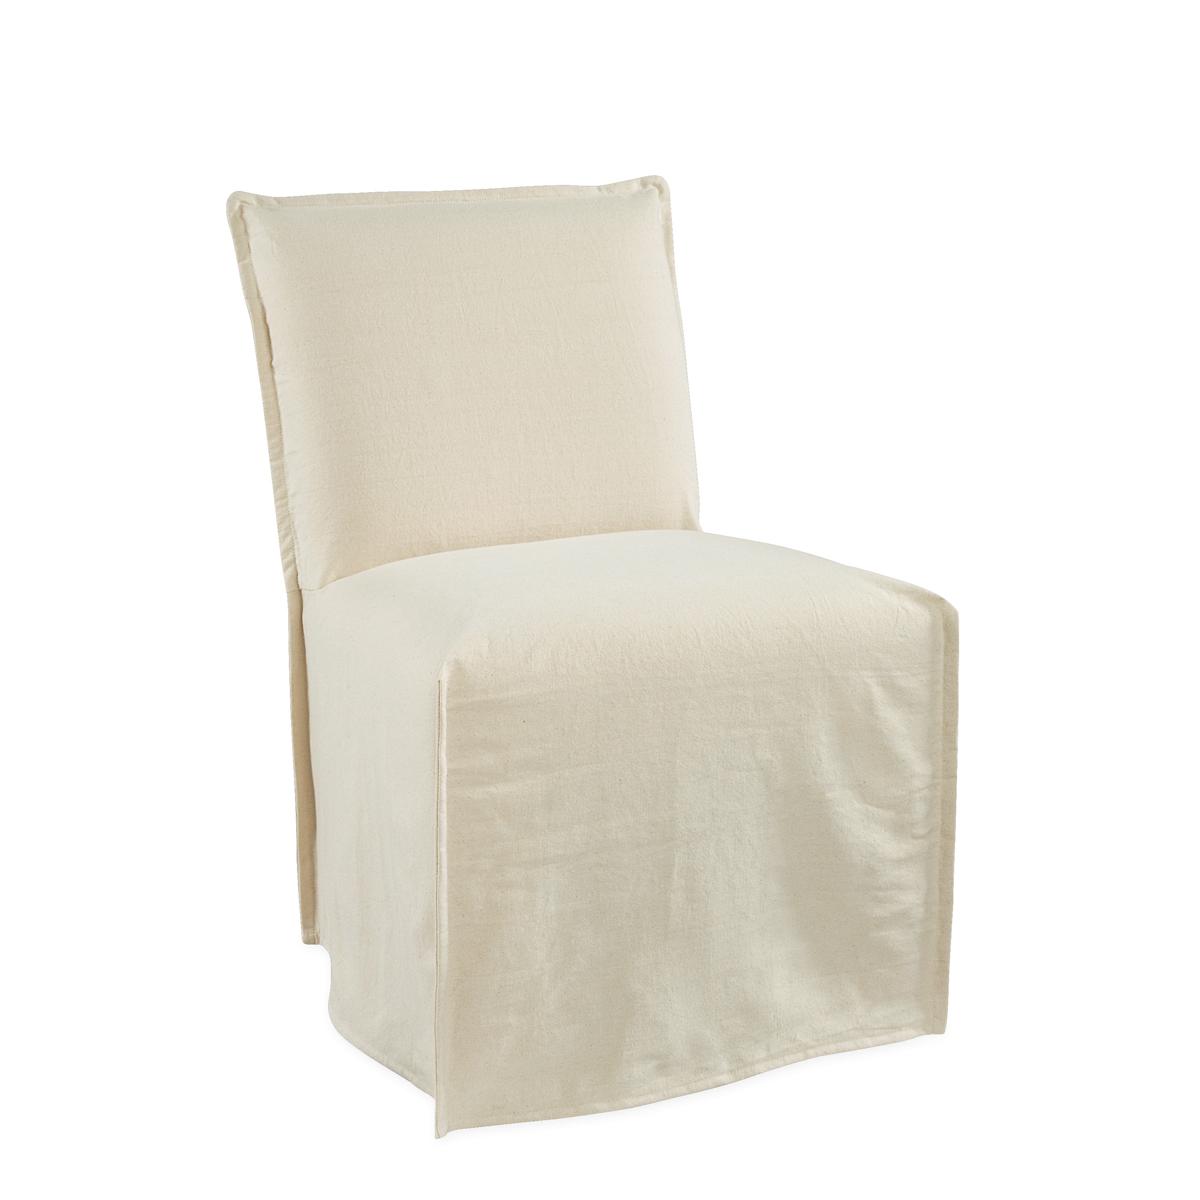 Slipcovered_Armless_Dining_Chair_C1747-01_Lee_Industries.jpg